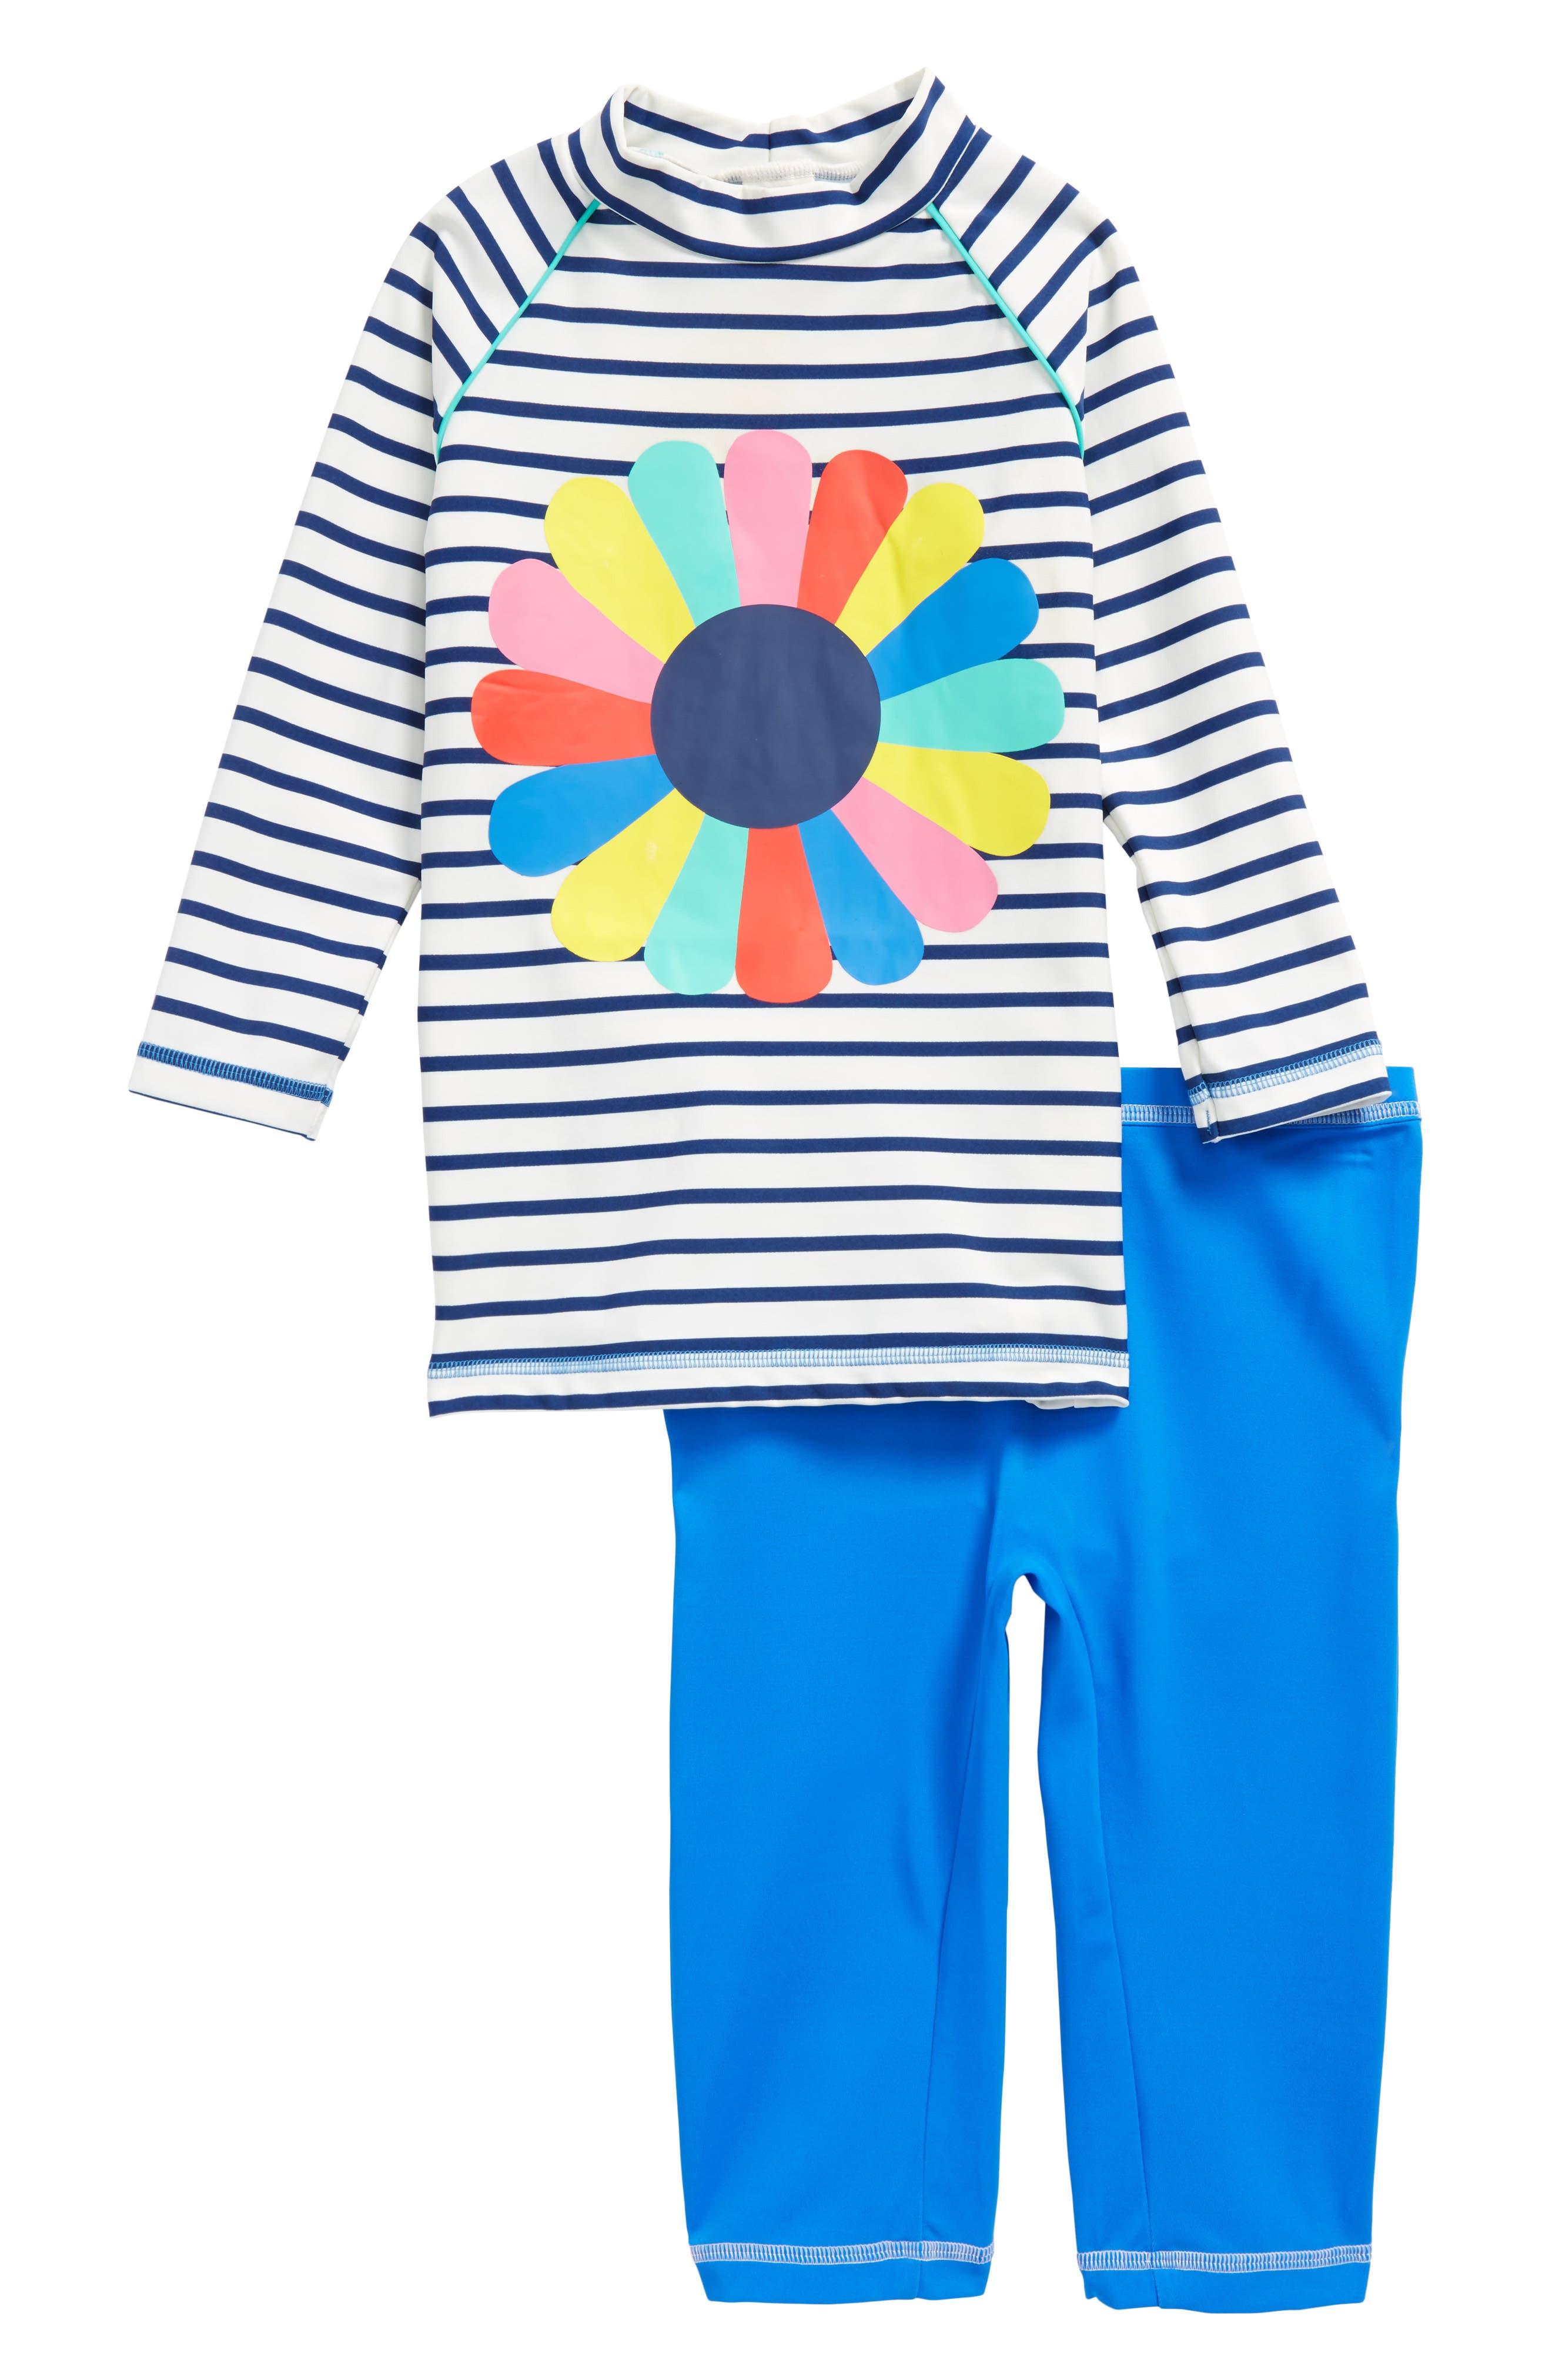 Sea Explorer Two-Piece Rashguard Swimsuit,                             Main thumbnail 1, color,                             Ivory/ Deep Sea Blue/ Flower